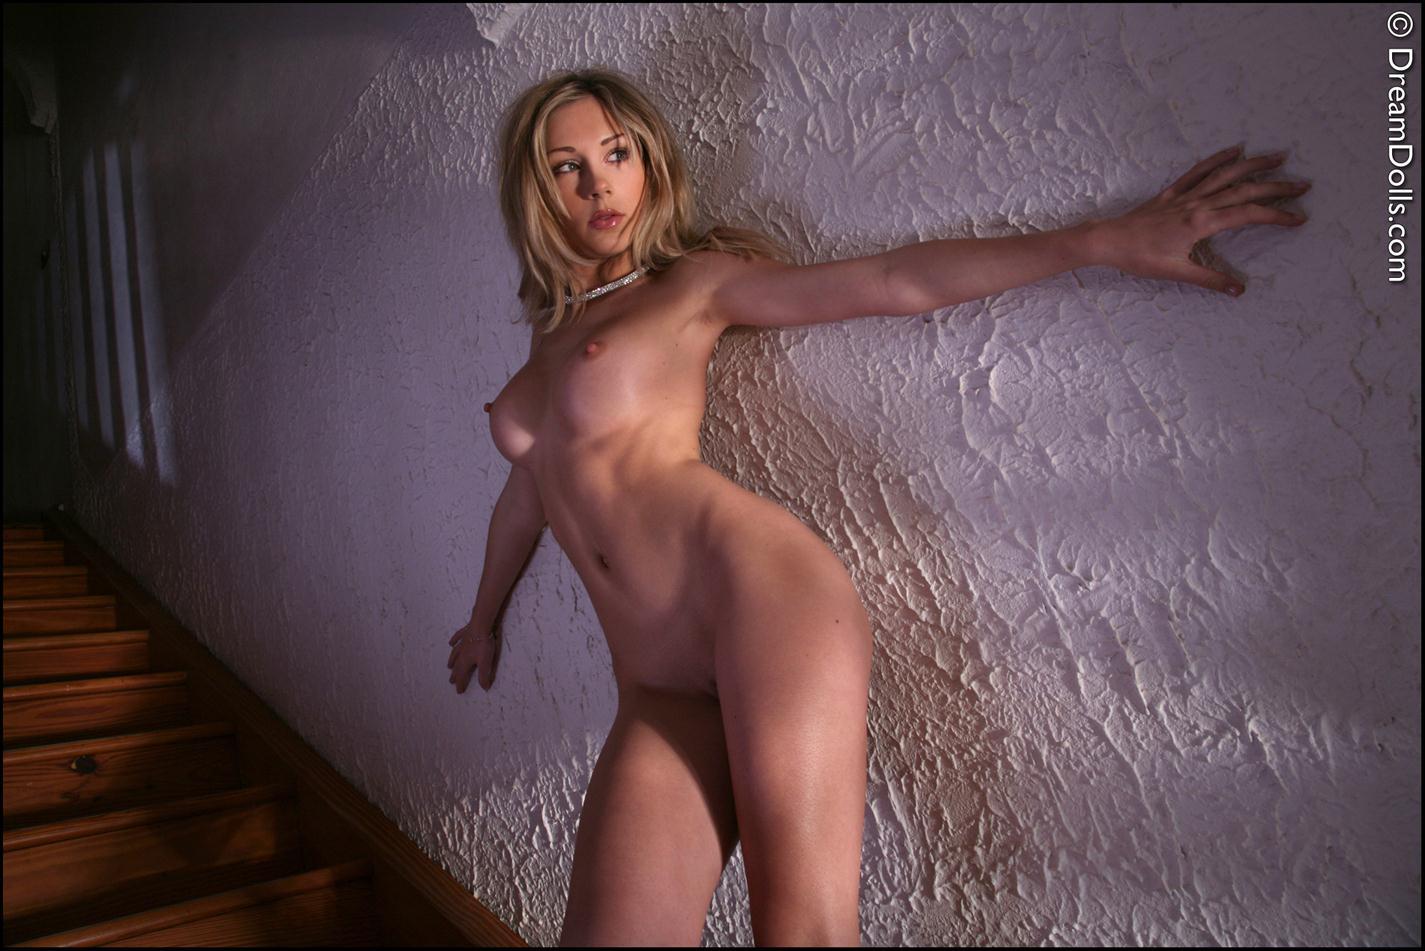 julia crown nude